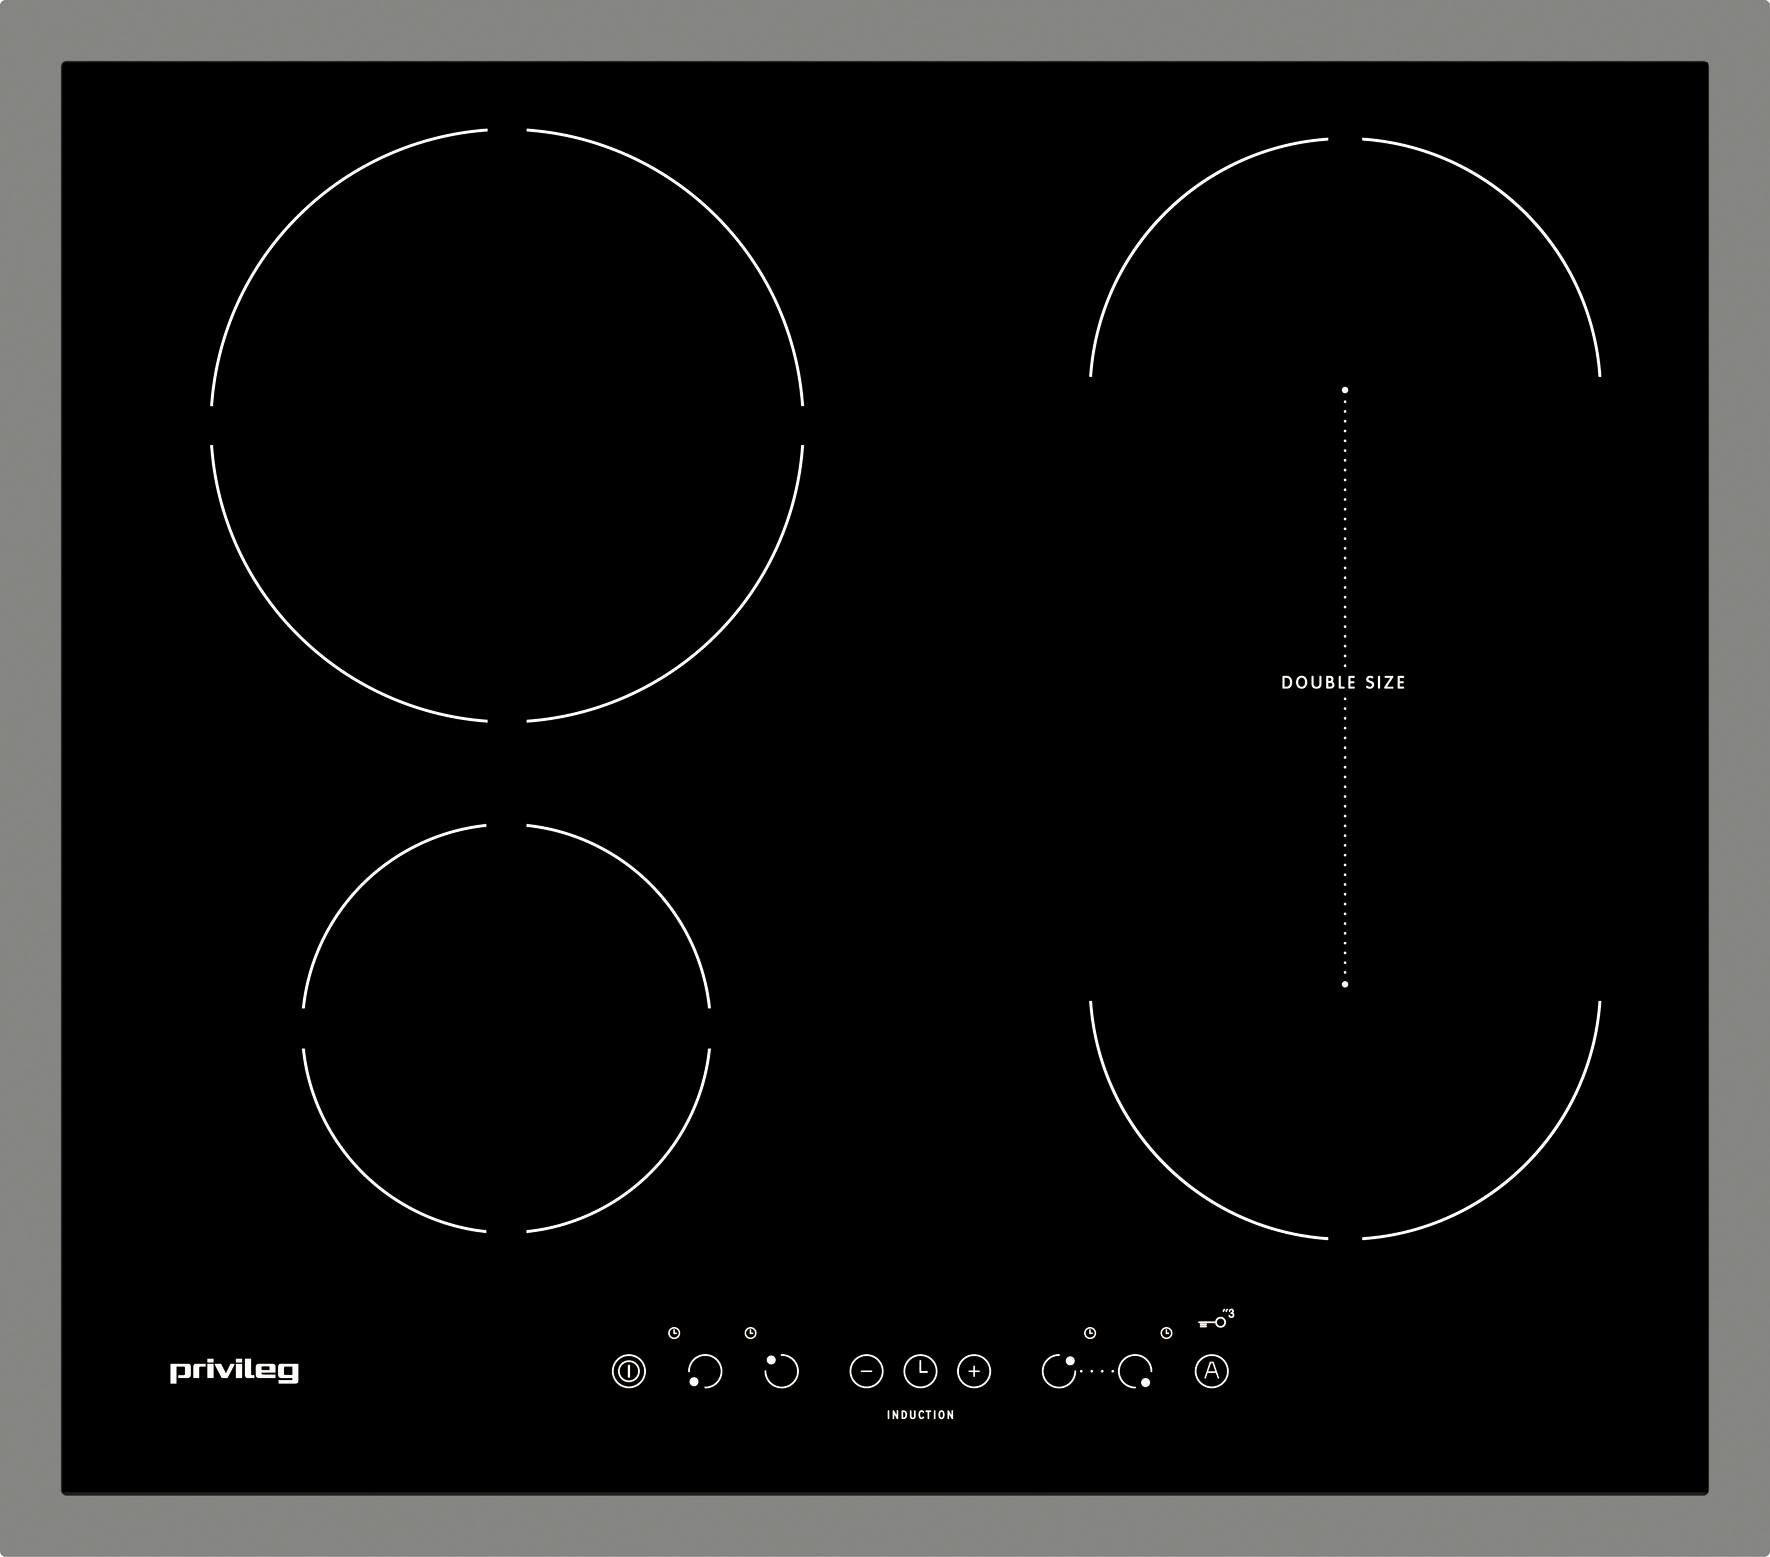 Privileg Induktions-Kochfeld PCTAI 6040C IN, mit CombiCook-Kochzone